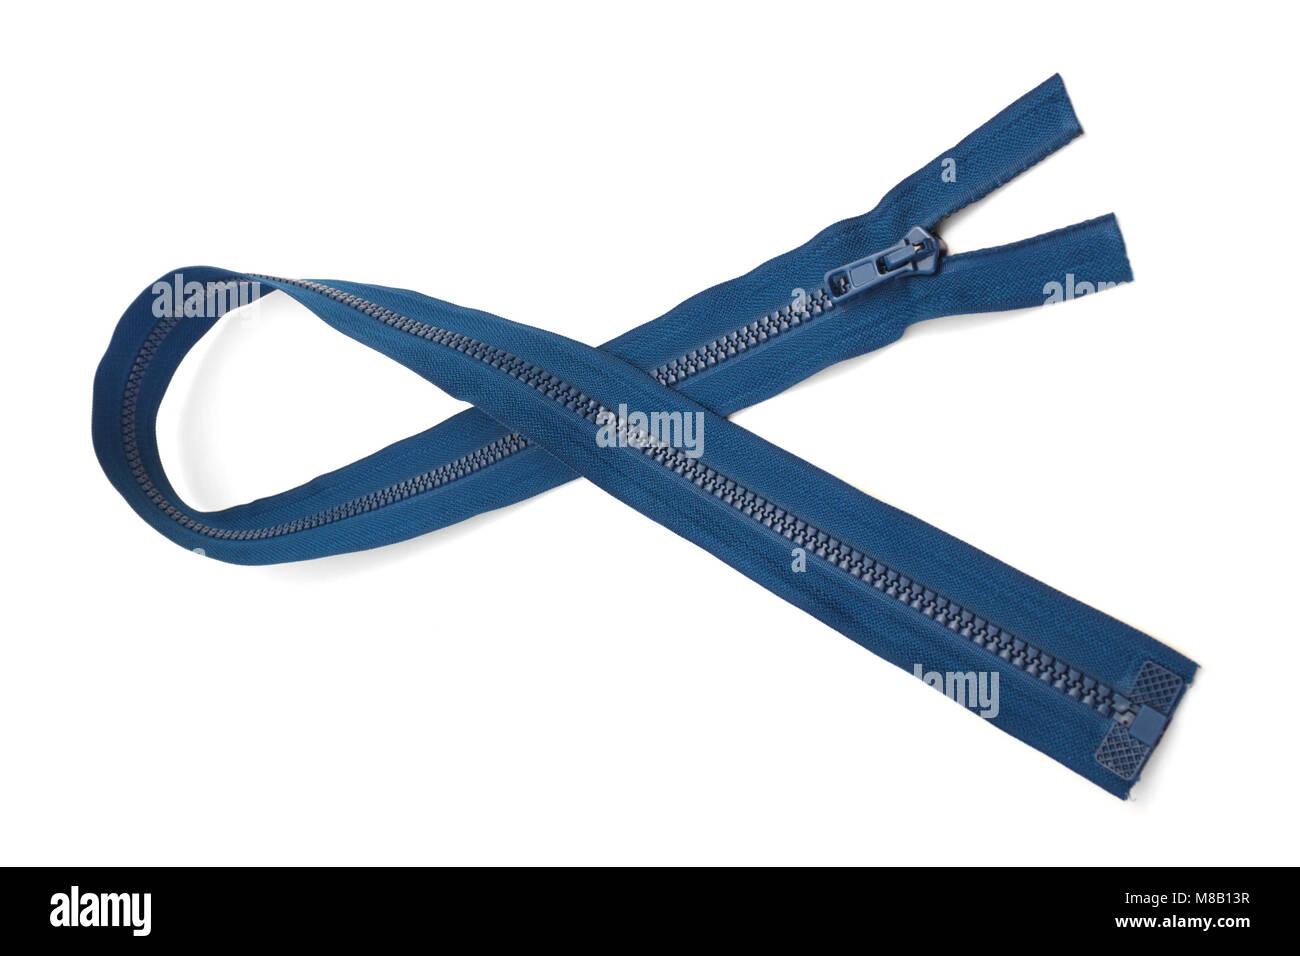 Blue long zipper closeup isolated on white background - Stock Image